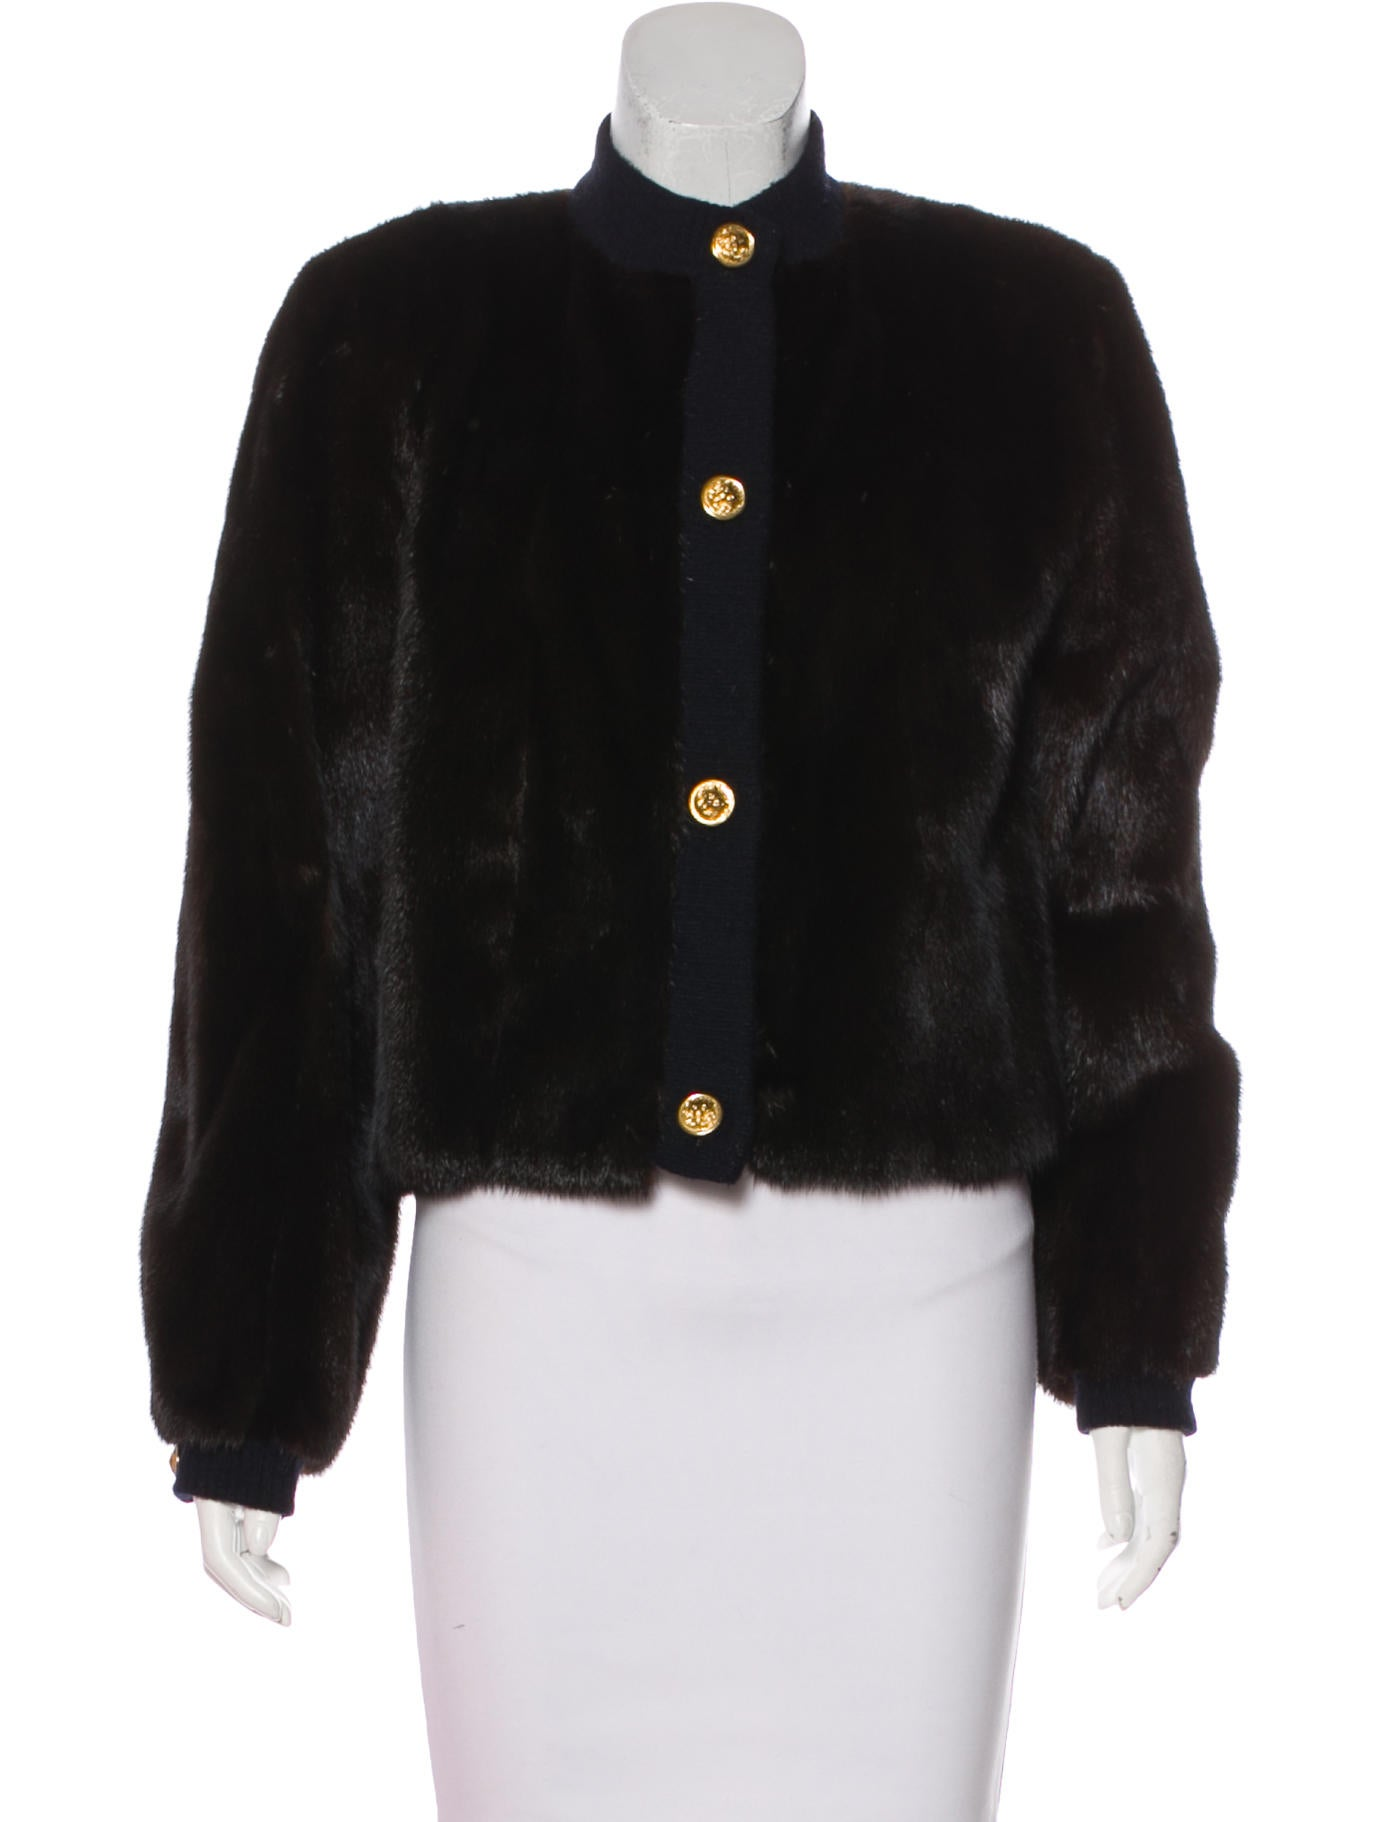 neiman marcus mink fur jacket clothing nemrc20391. Black Bedroom Furniture Sets. Home Design Ideas